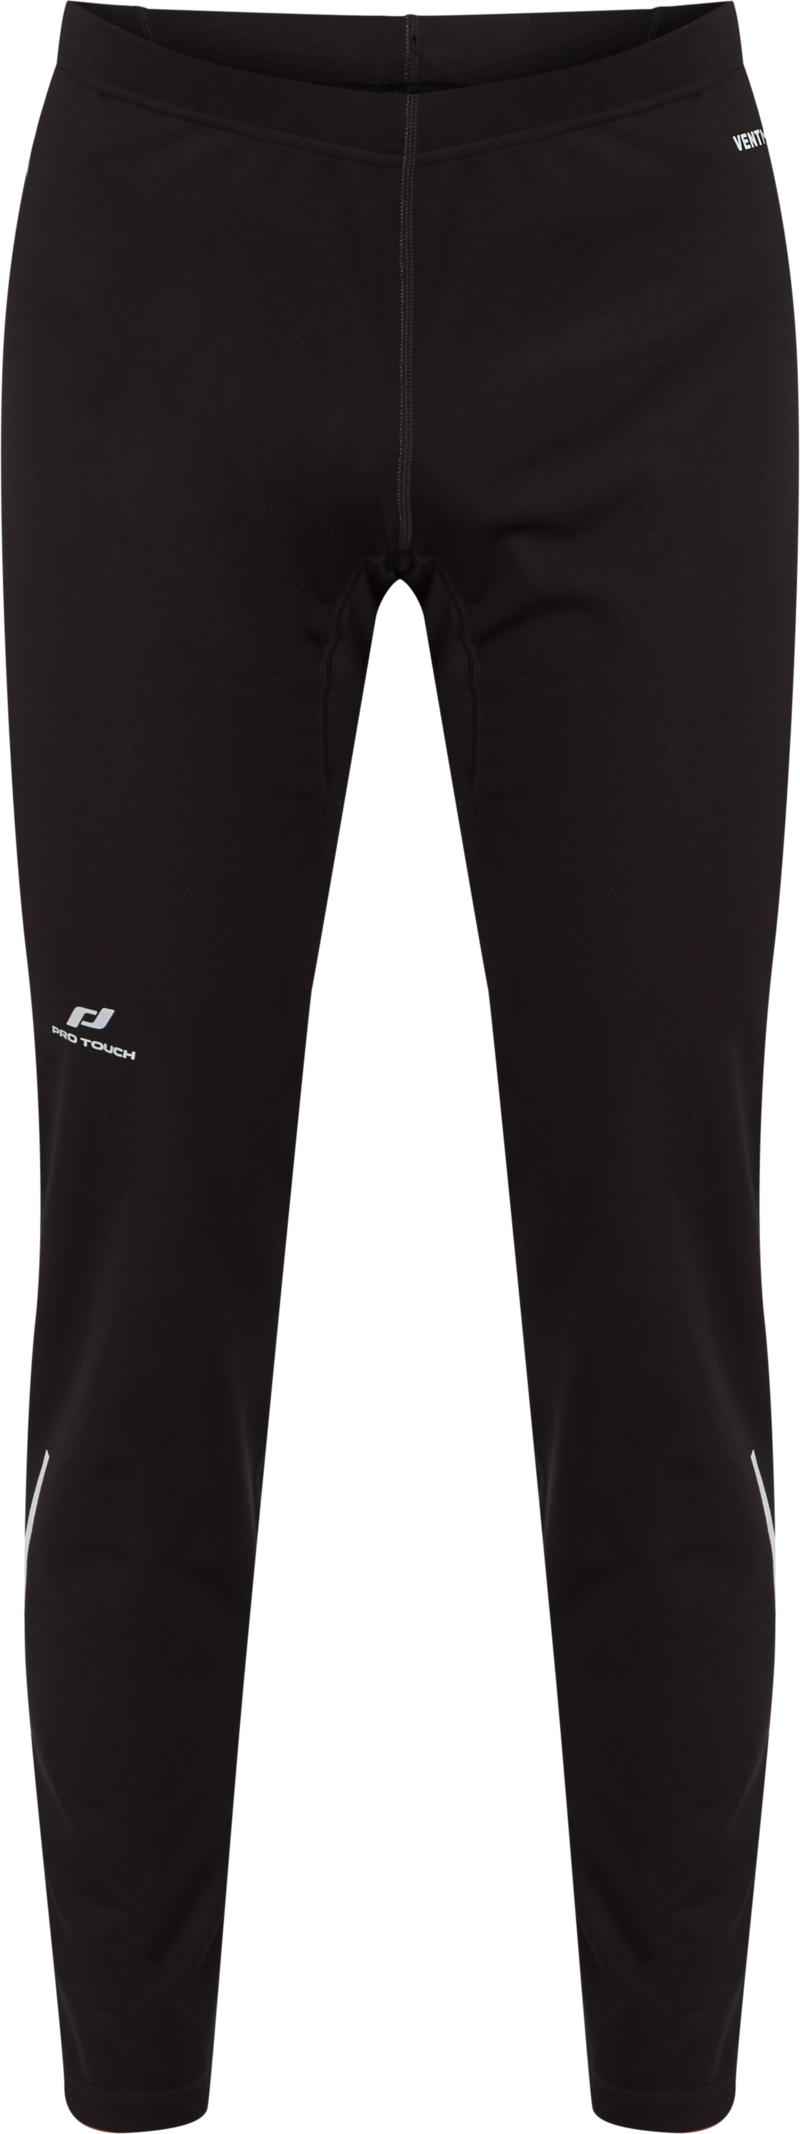 Pro Touch SILO II UX, muške helanke za trčanje, crna